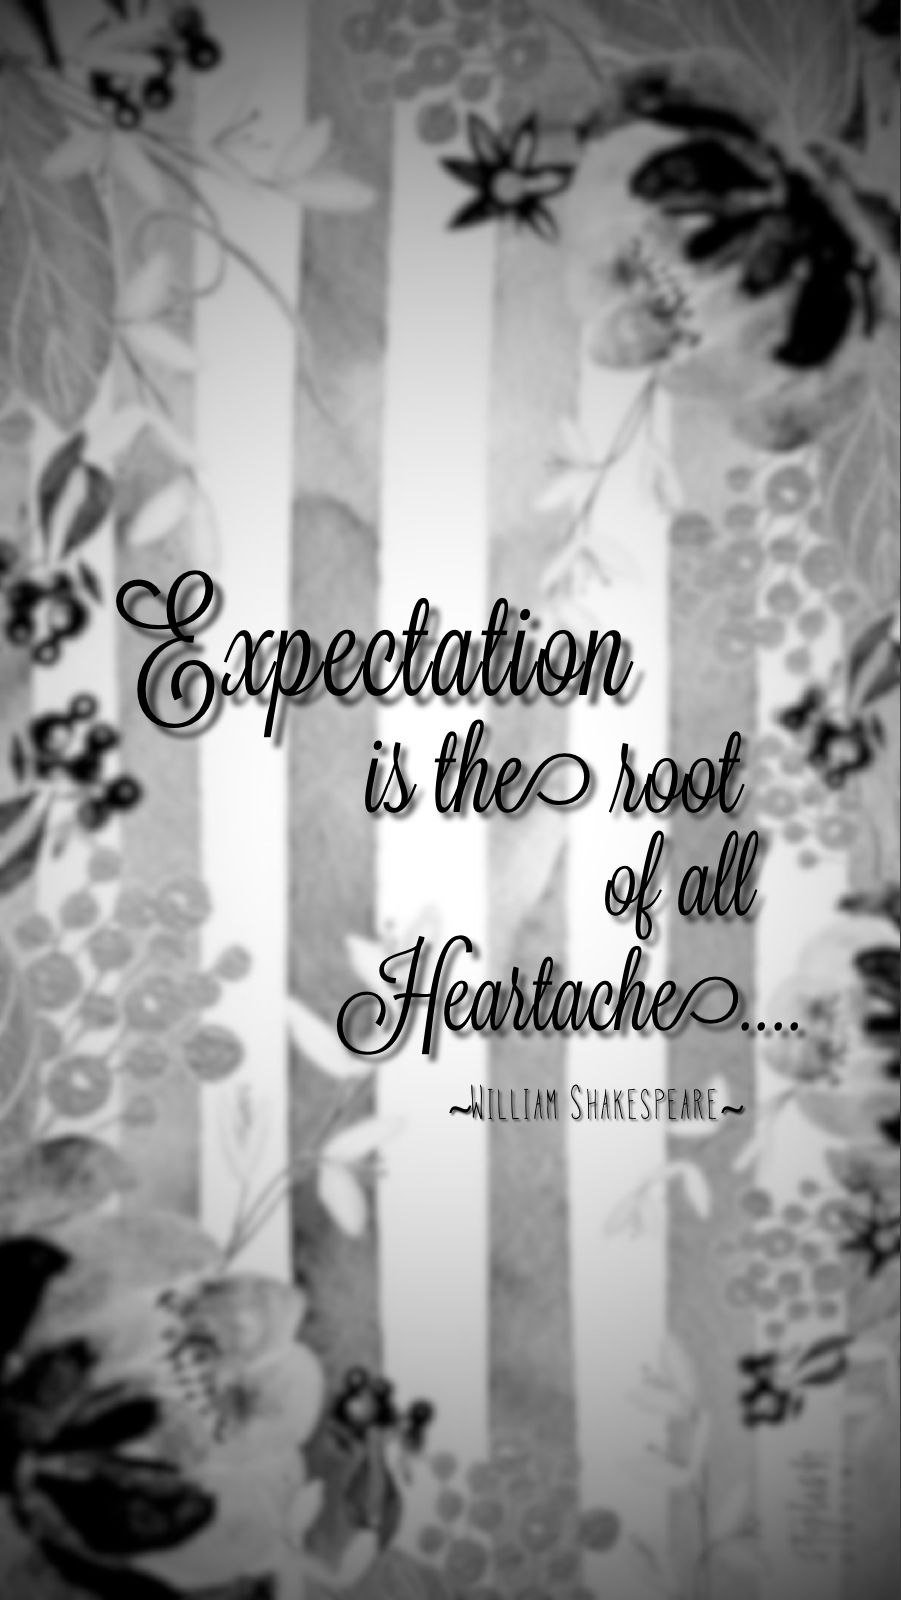 Expectations quote william shakespeare wallpaper